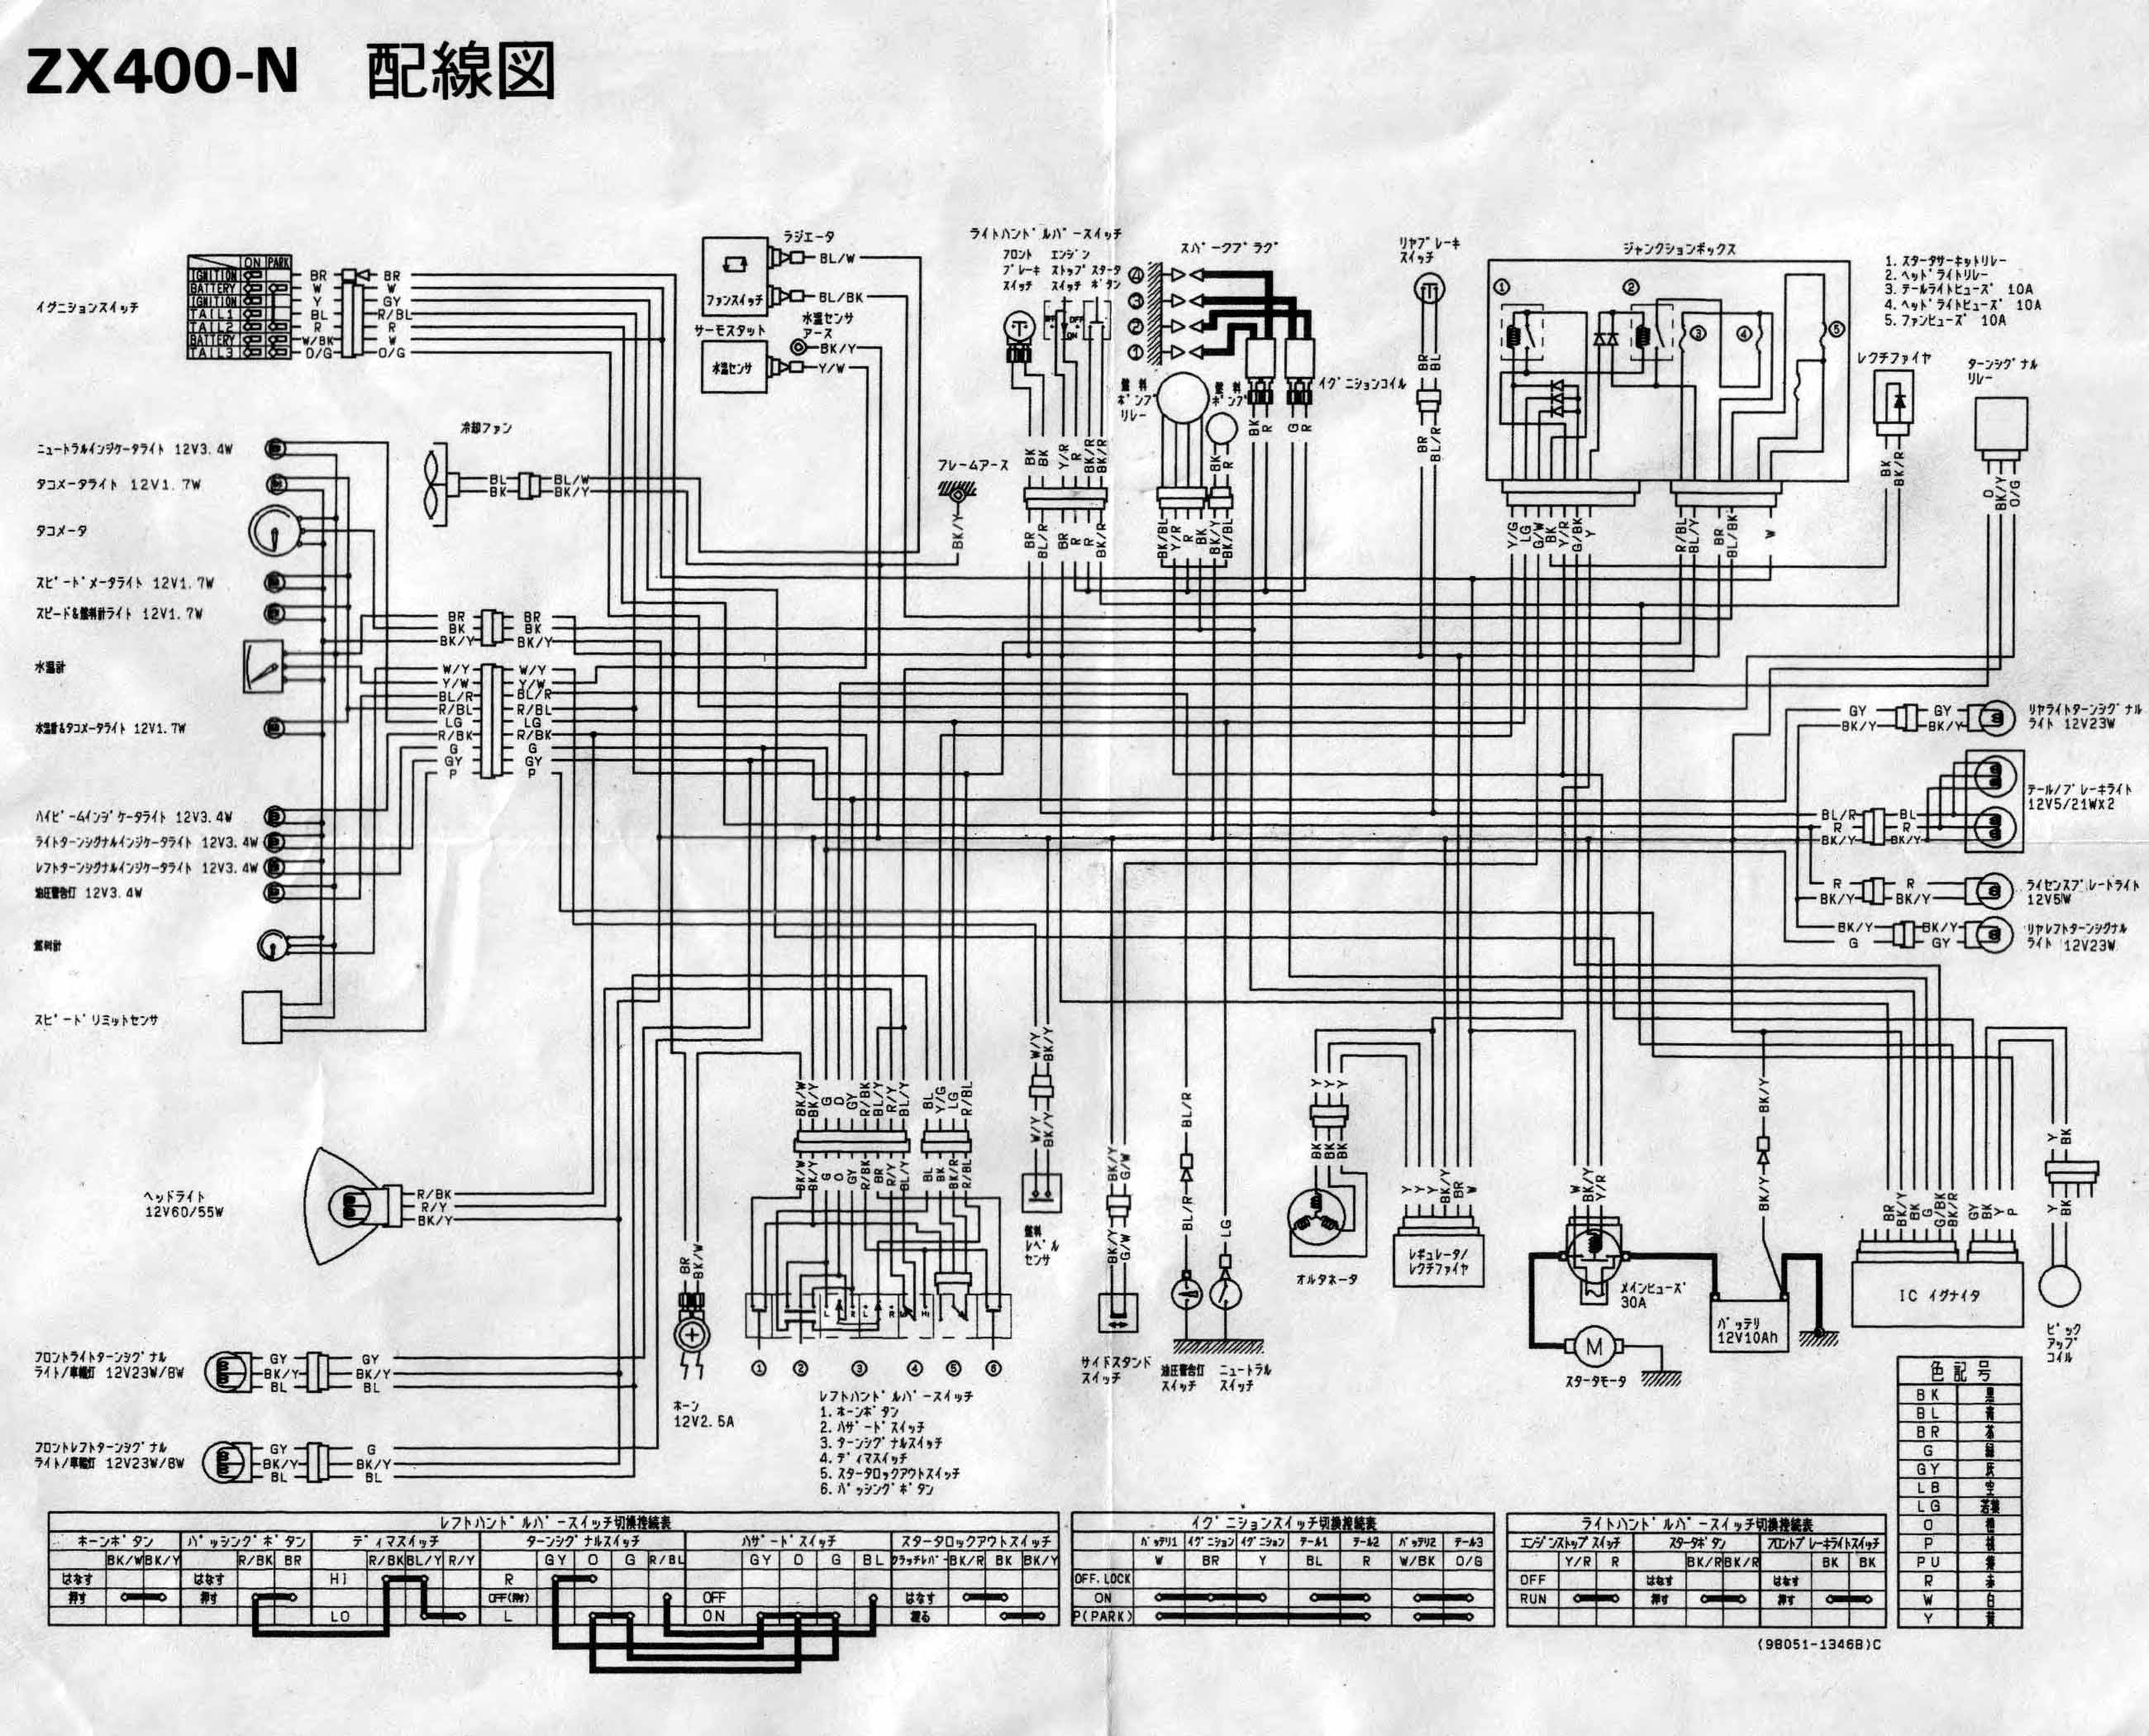 2003 Kawasaki Zx12 Wiring Diagram Car Diagrams Explained Z900 Motorcycle Manuals Pdf Fault Codes Rh Manual Com Zzr 1200 Review